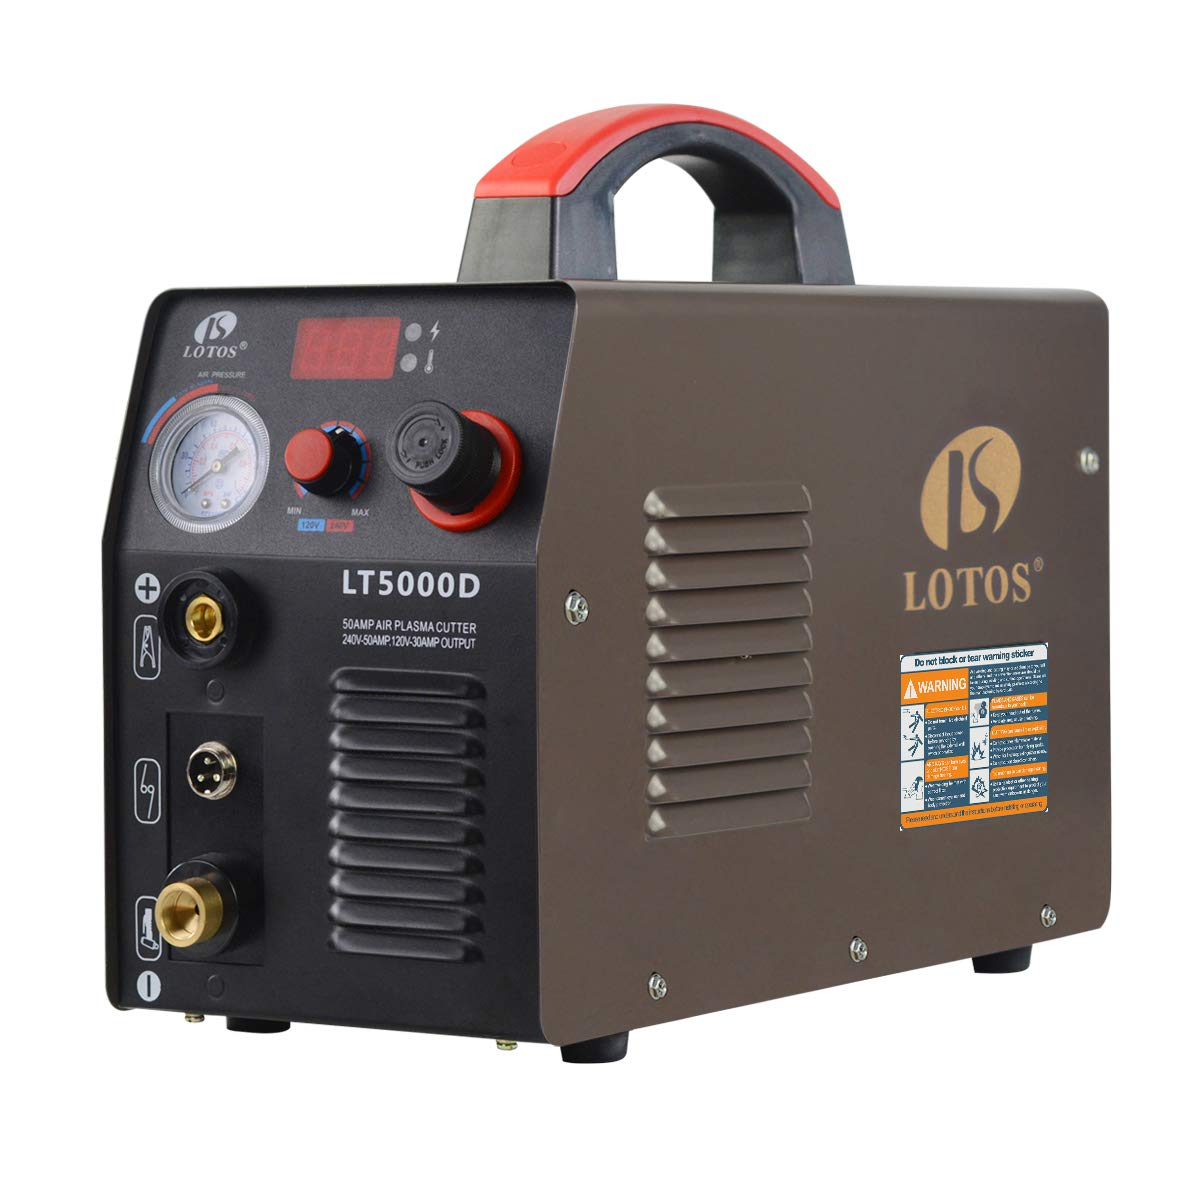 Lotos LT5000D Plasma Cutter 50Amps Dual Voltage Compact Metal Cutter 110/220V AC 1/2'' Clean Cut by Lotos Technology